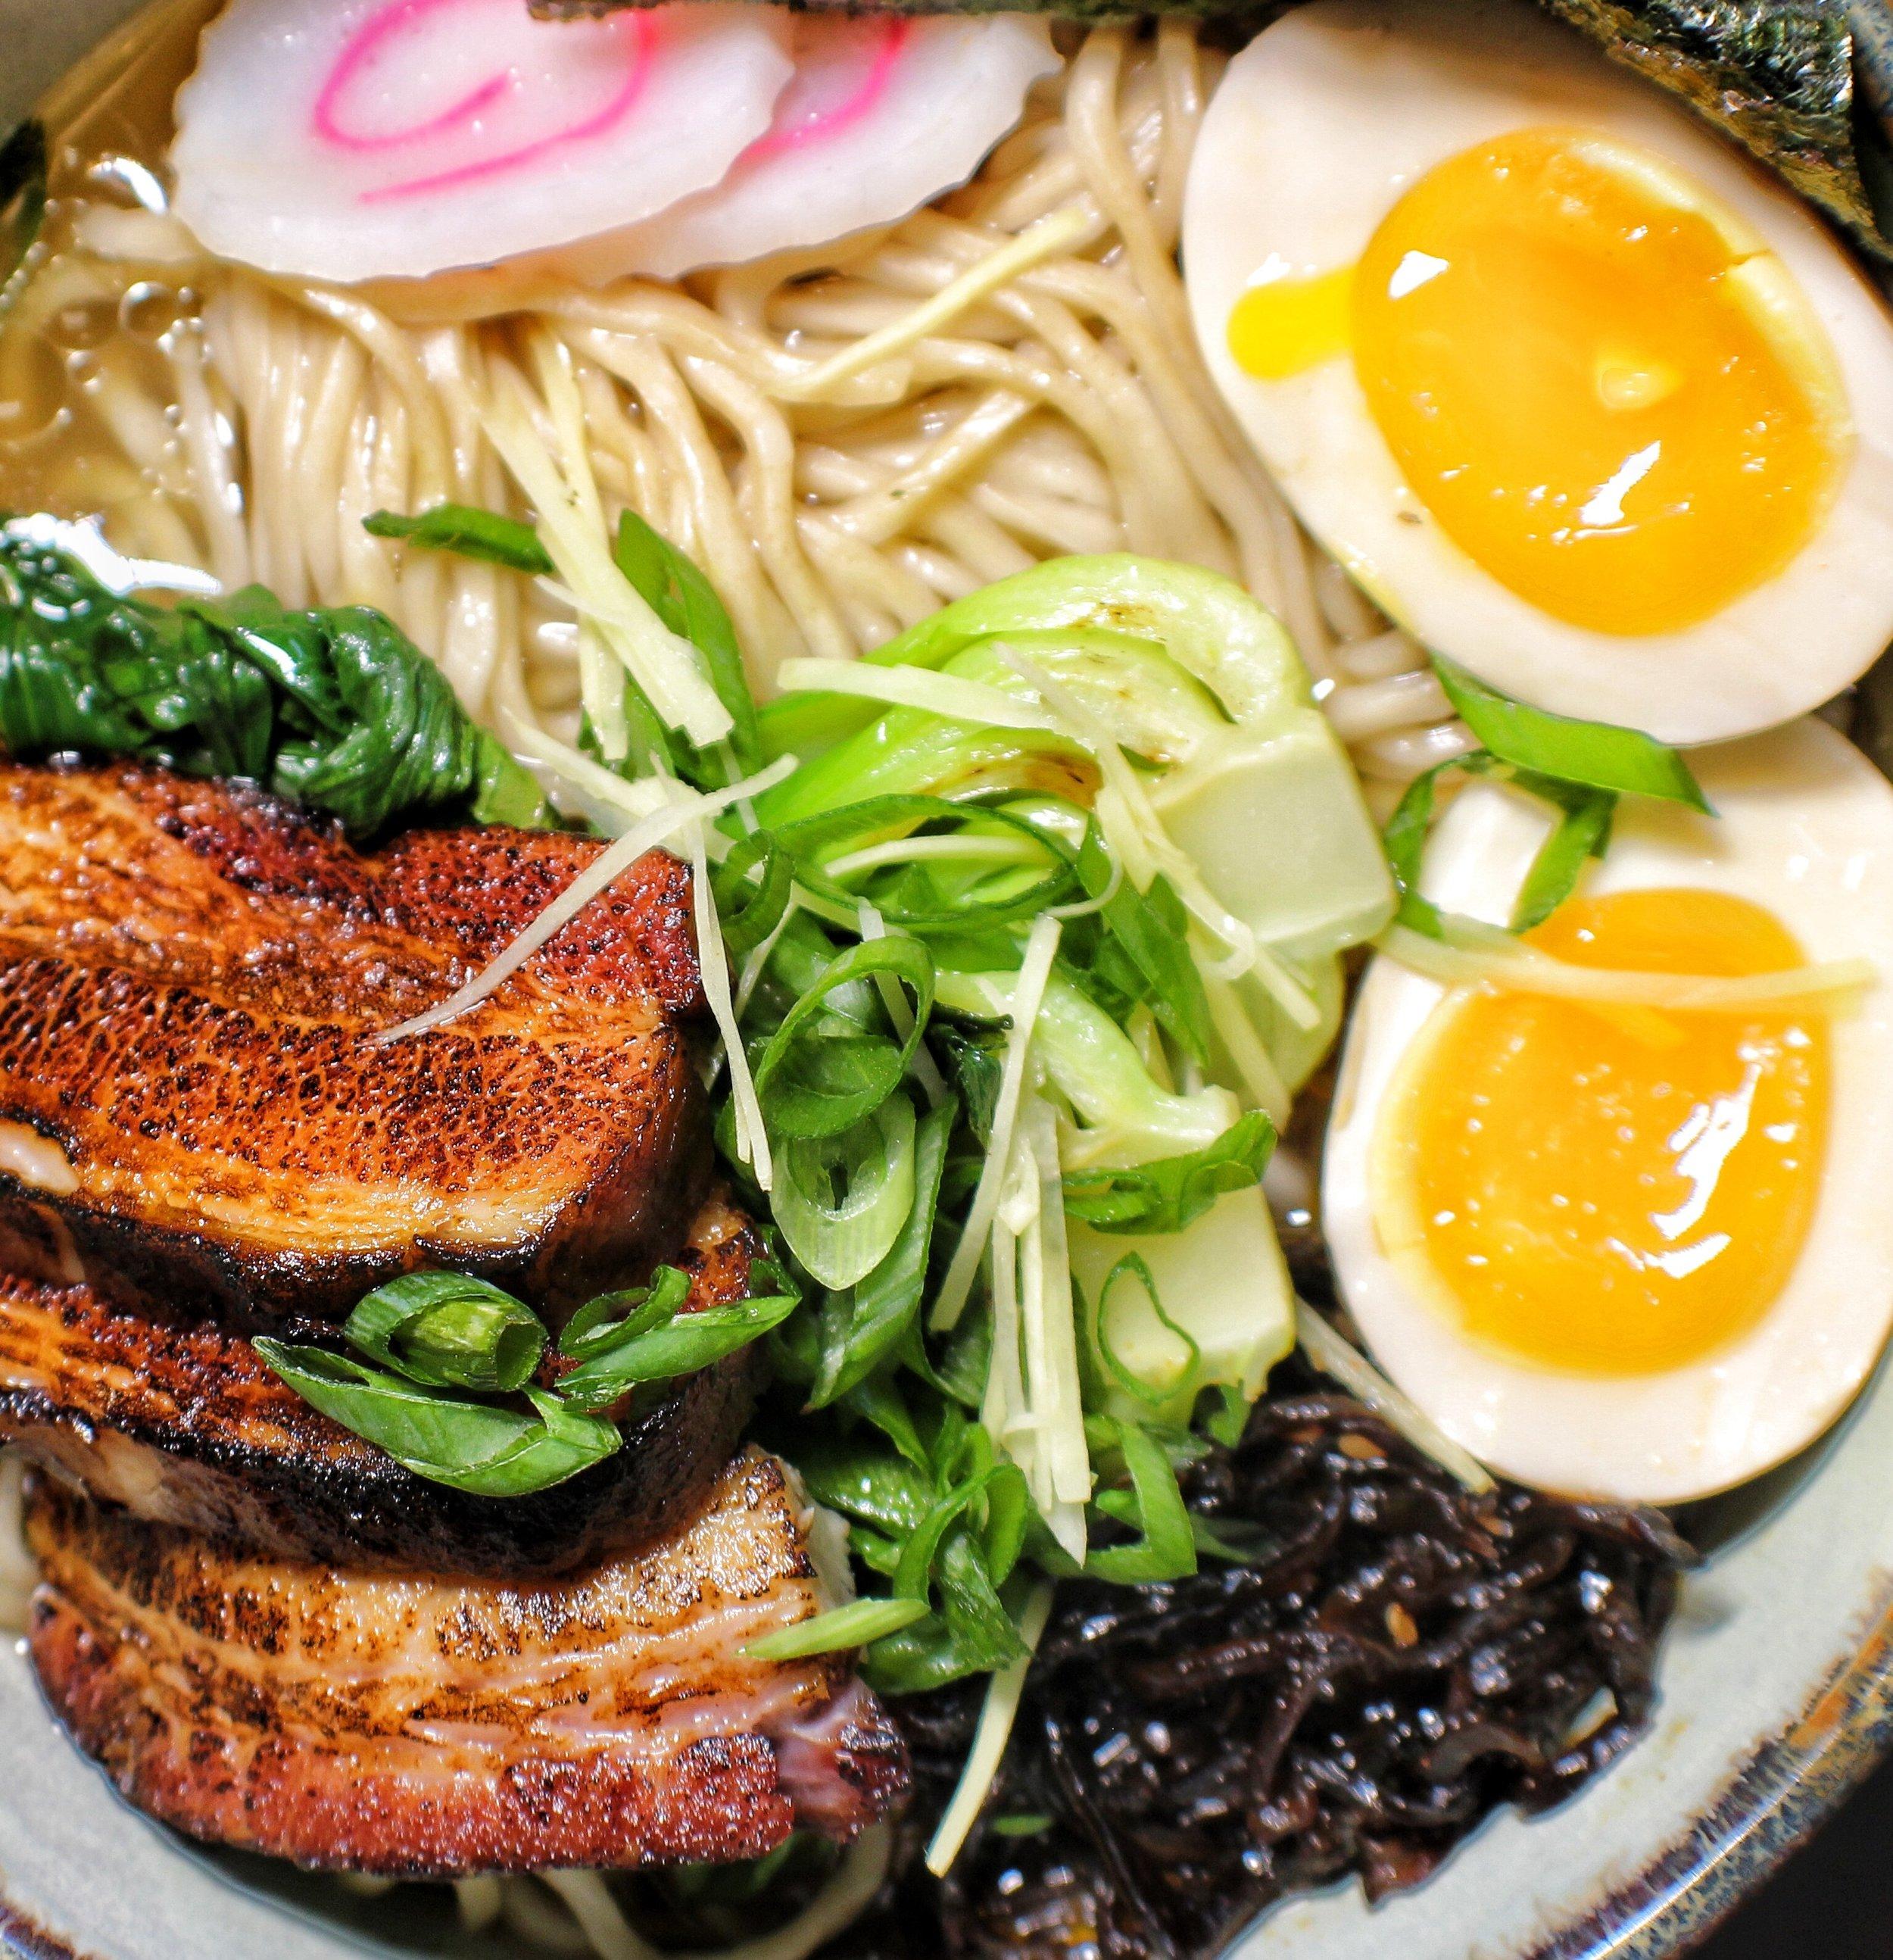 saimin noodles  kalua pork belly, soft egg, asian greens